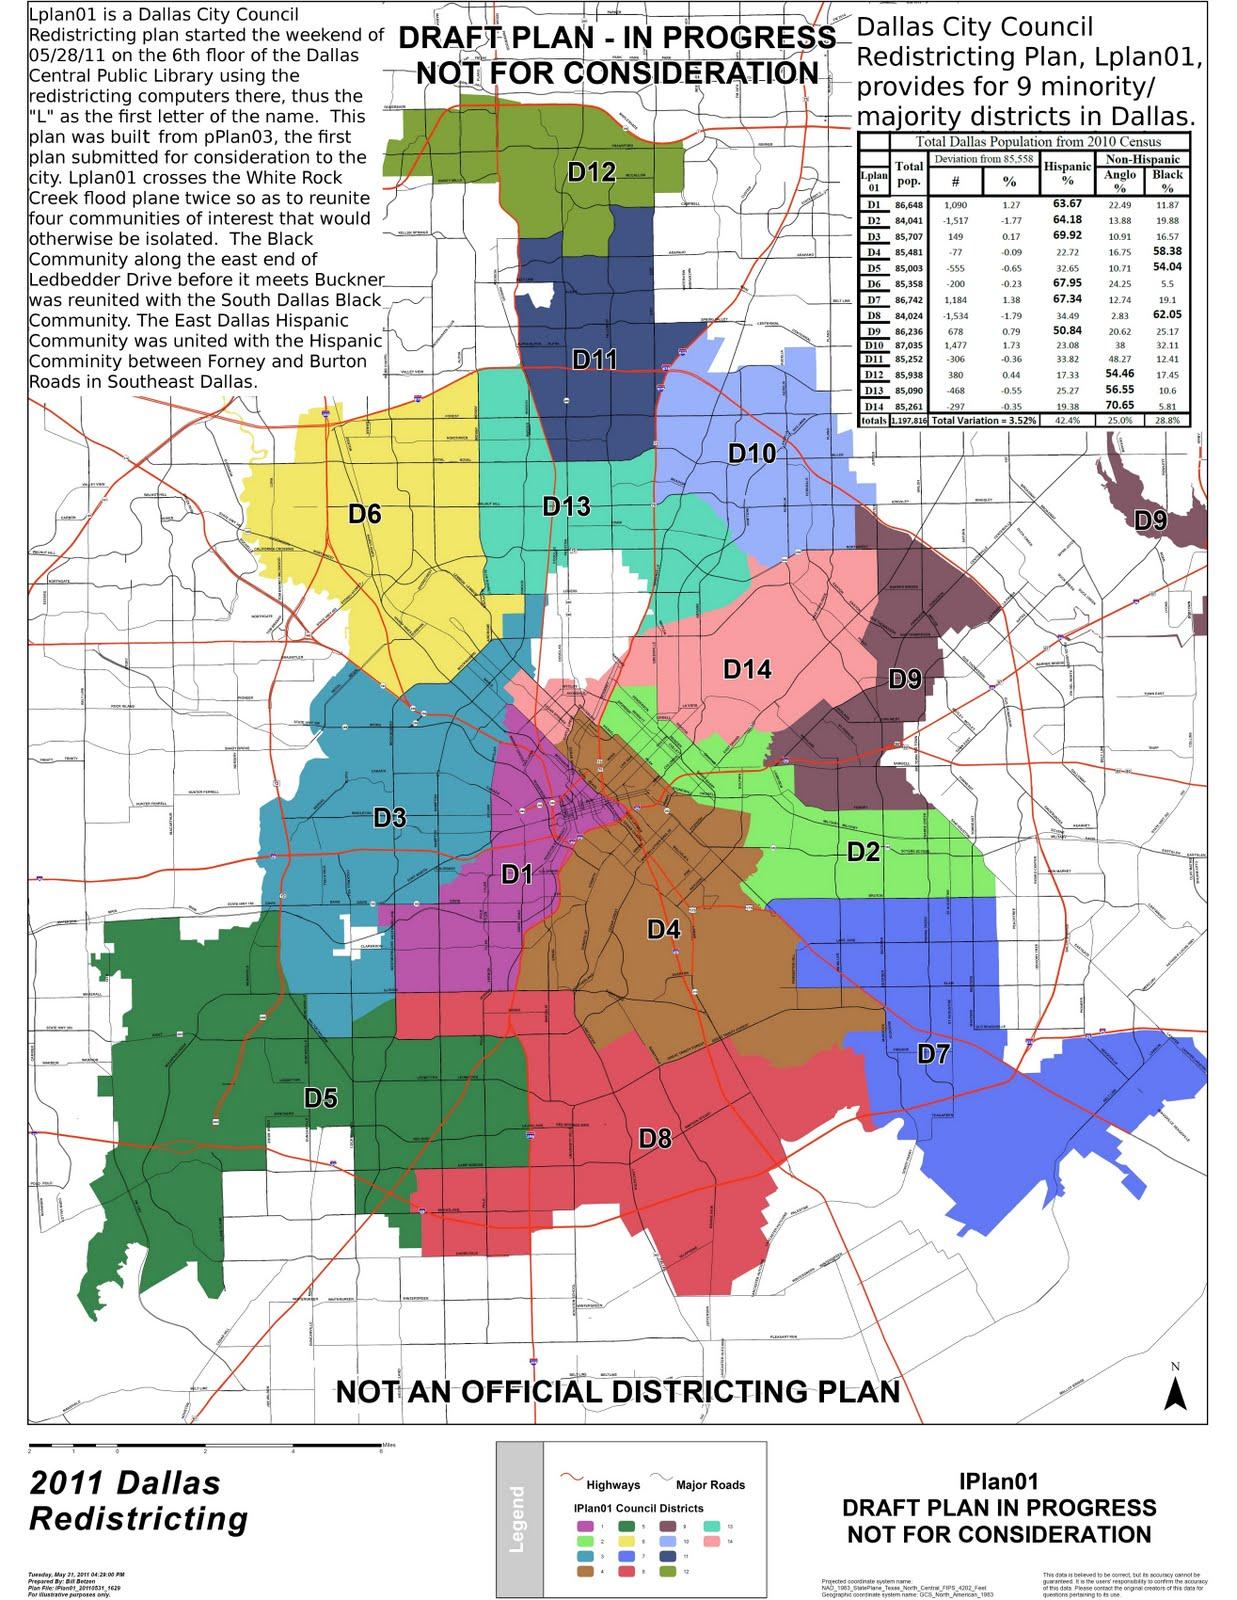 Dallas Redistricting 2011: Second Dallas City Council ... on washington dc city map, dfw area map, yoakum city map, princeton city map, dallas old maps, fort worth texas city limits map, university of chicago city map, palestine city map, grimes city map, houston city map, denton city map, greeneville city map, new roads city map, richardson city map, dallas population 2014, lewisville city map, adairsville city map, johnson county city map, ft worth city map, waxahachie city map,